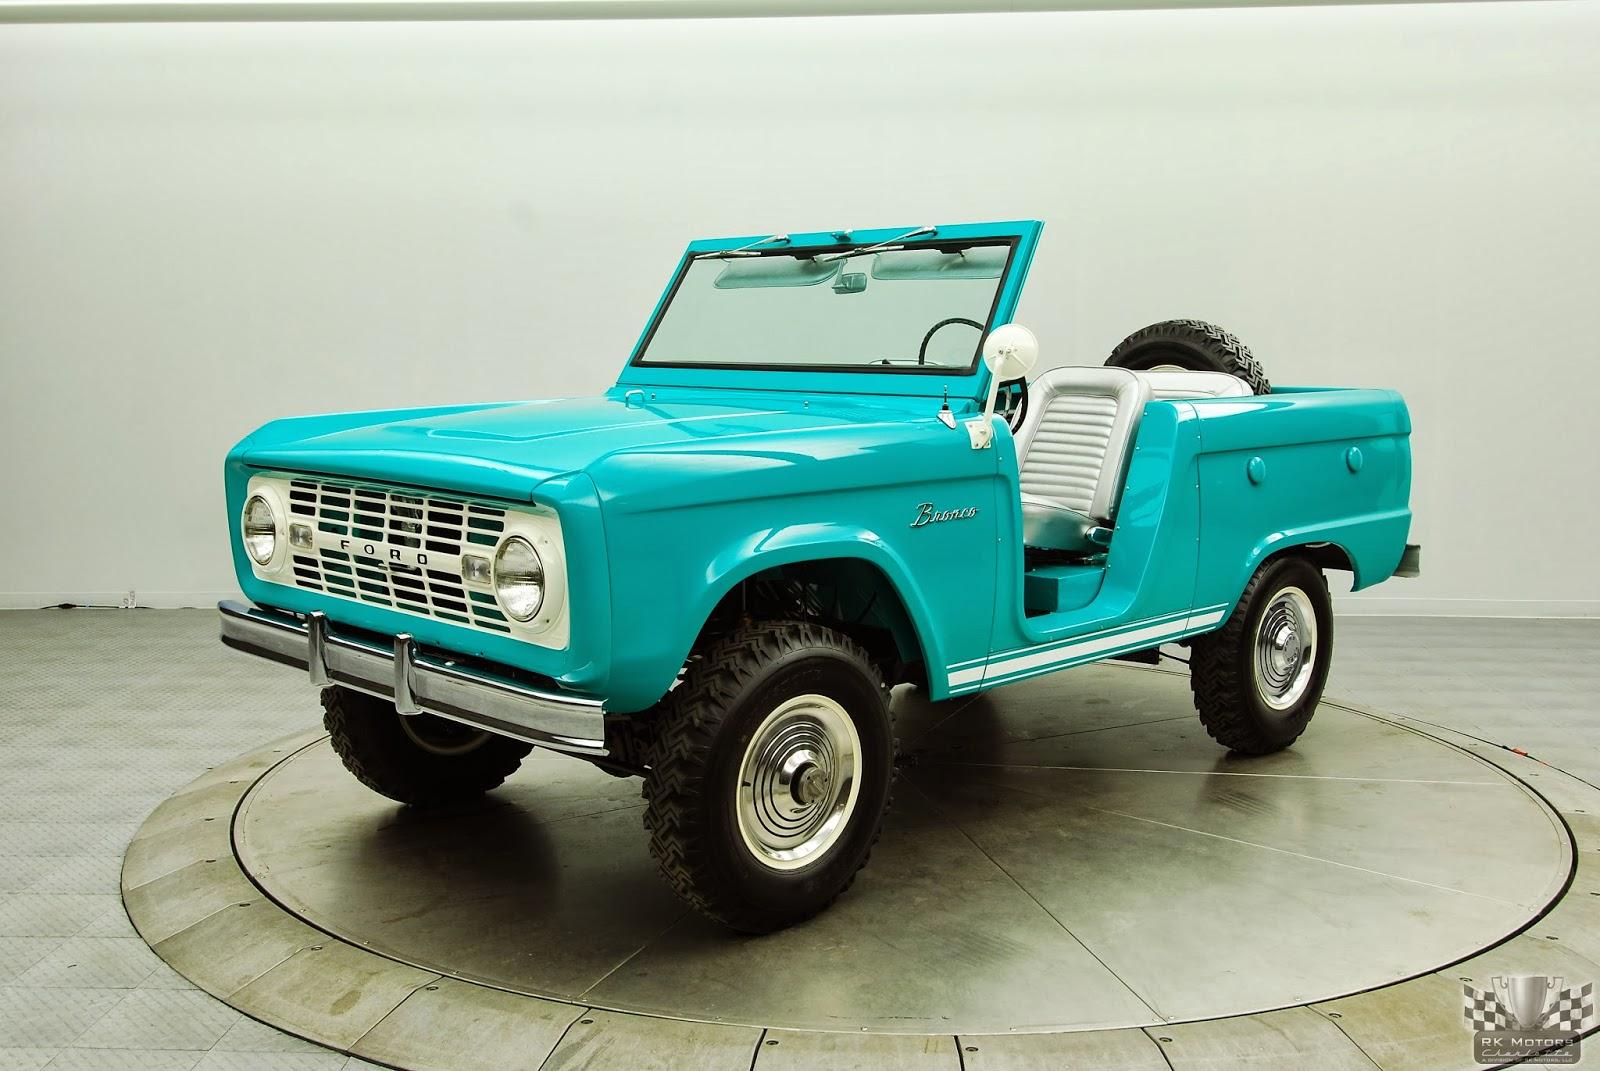 Net Cars Show: Ford 1st Generation Bronco U13 Roadster (1966-68)